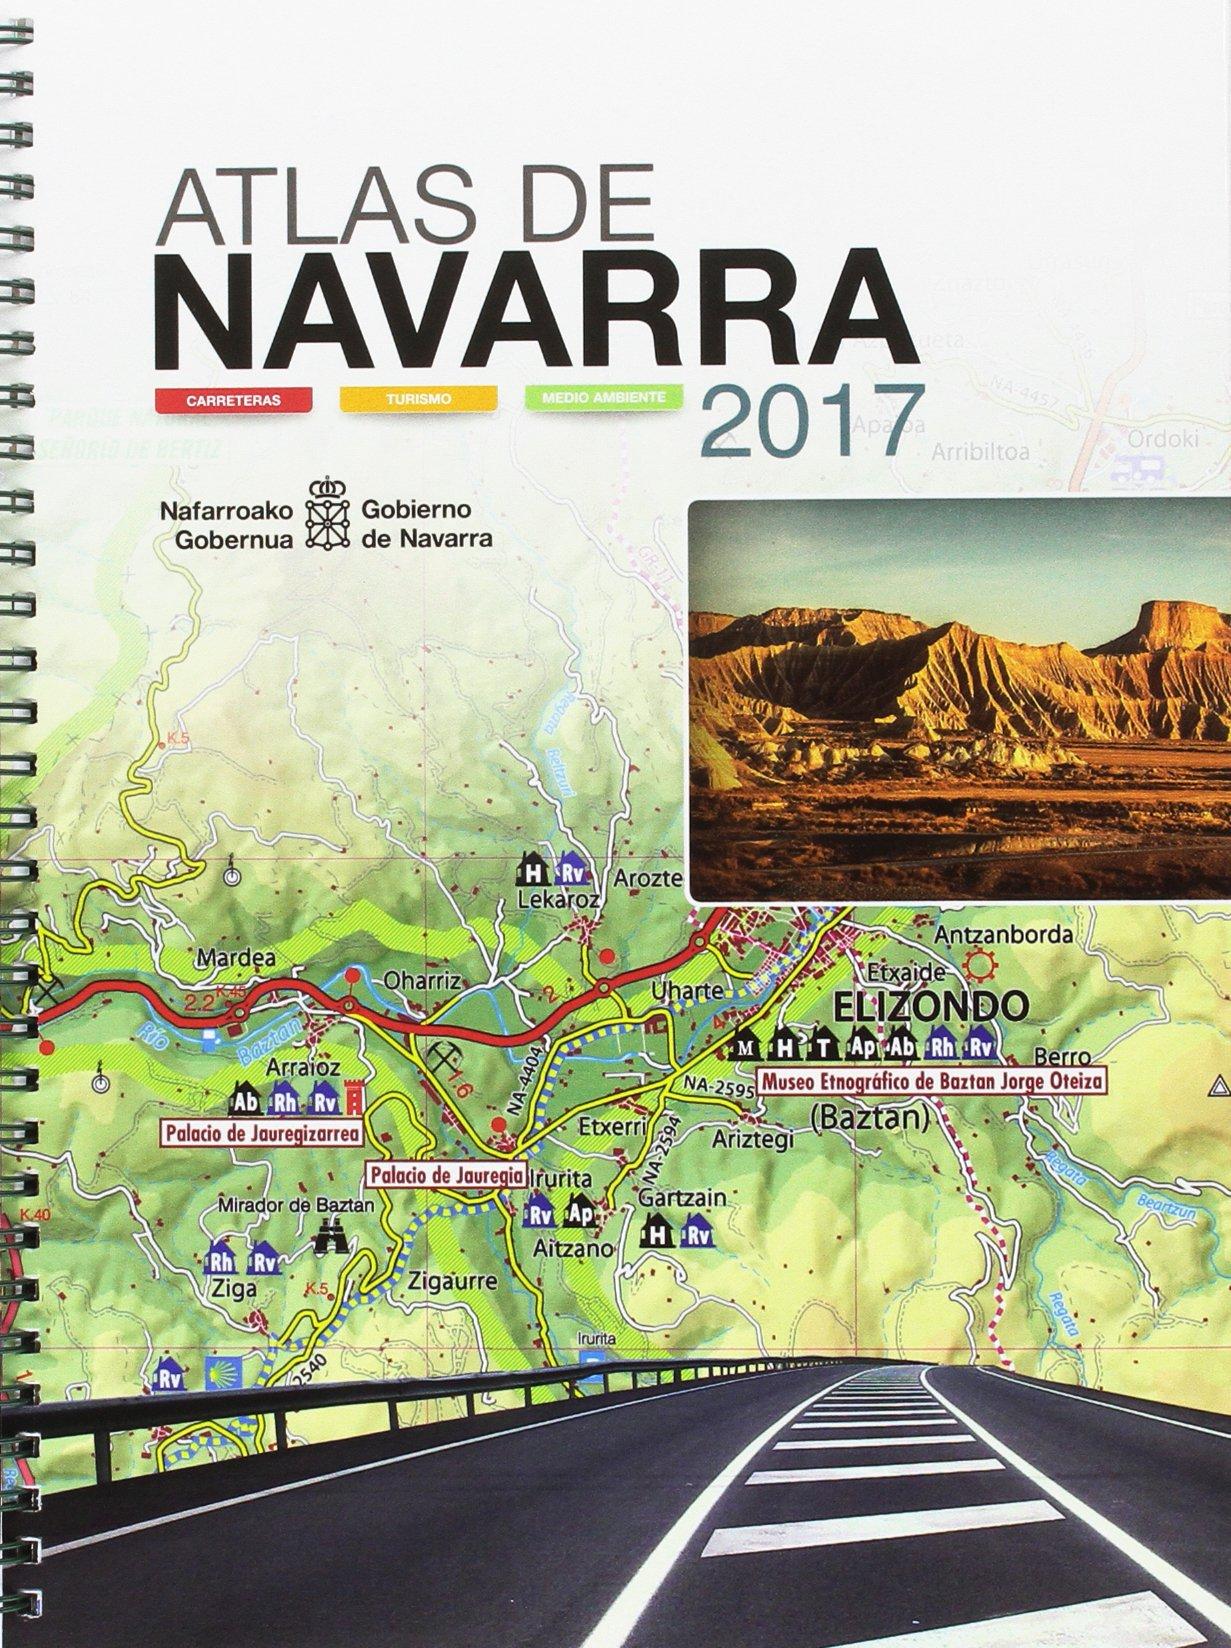 Atlas de Navarra 2017: Carreteras, turismo y medio ambiente Tapa blanda – 6 jul 2017 8423534472 Road atlases & maps Reiseführer: Abenteuerurlaub